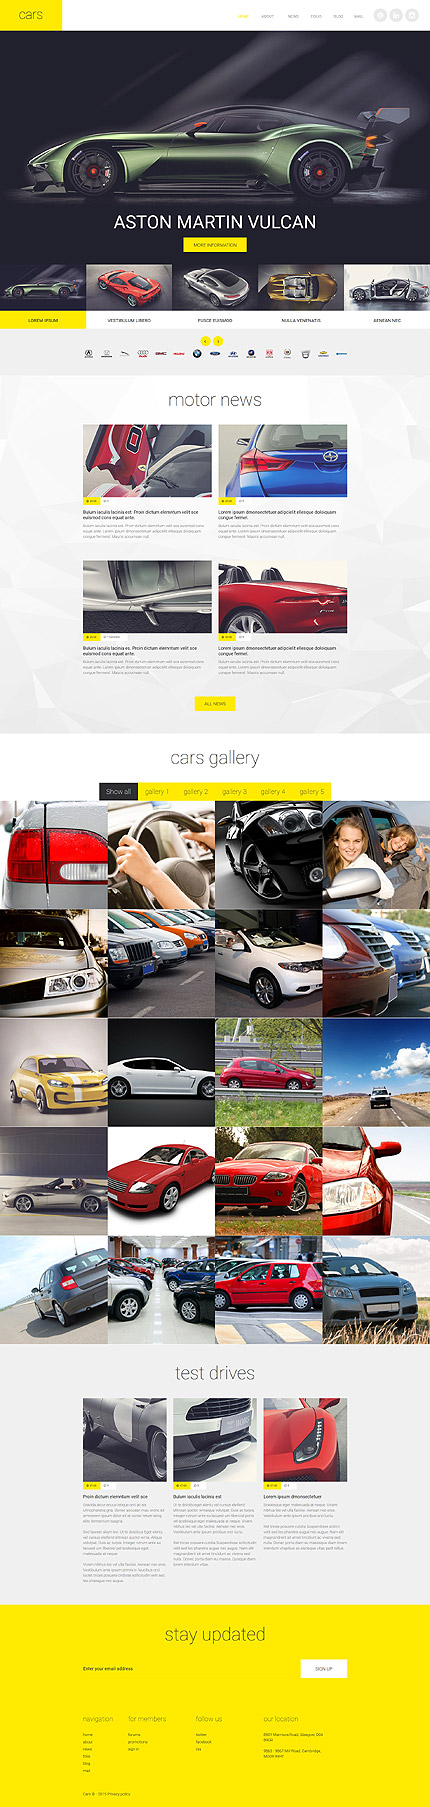 Motor News Joomla Template